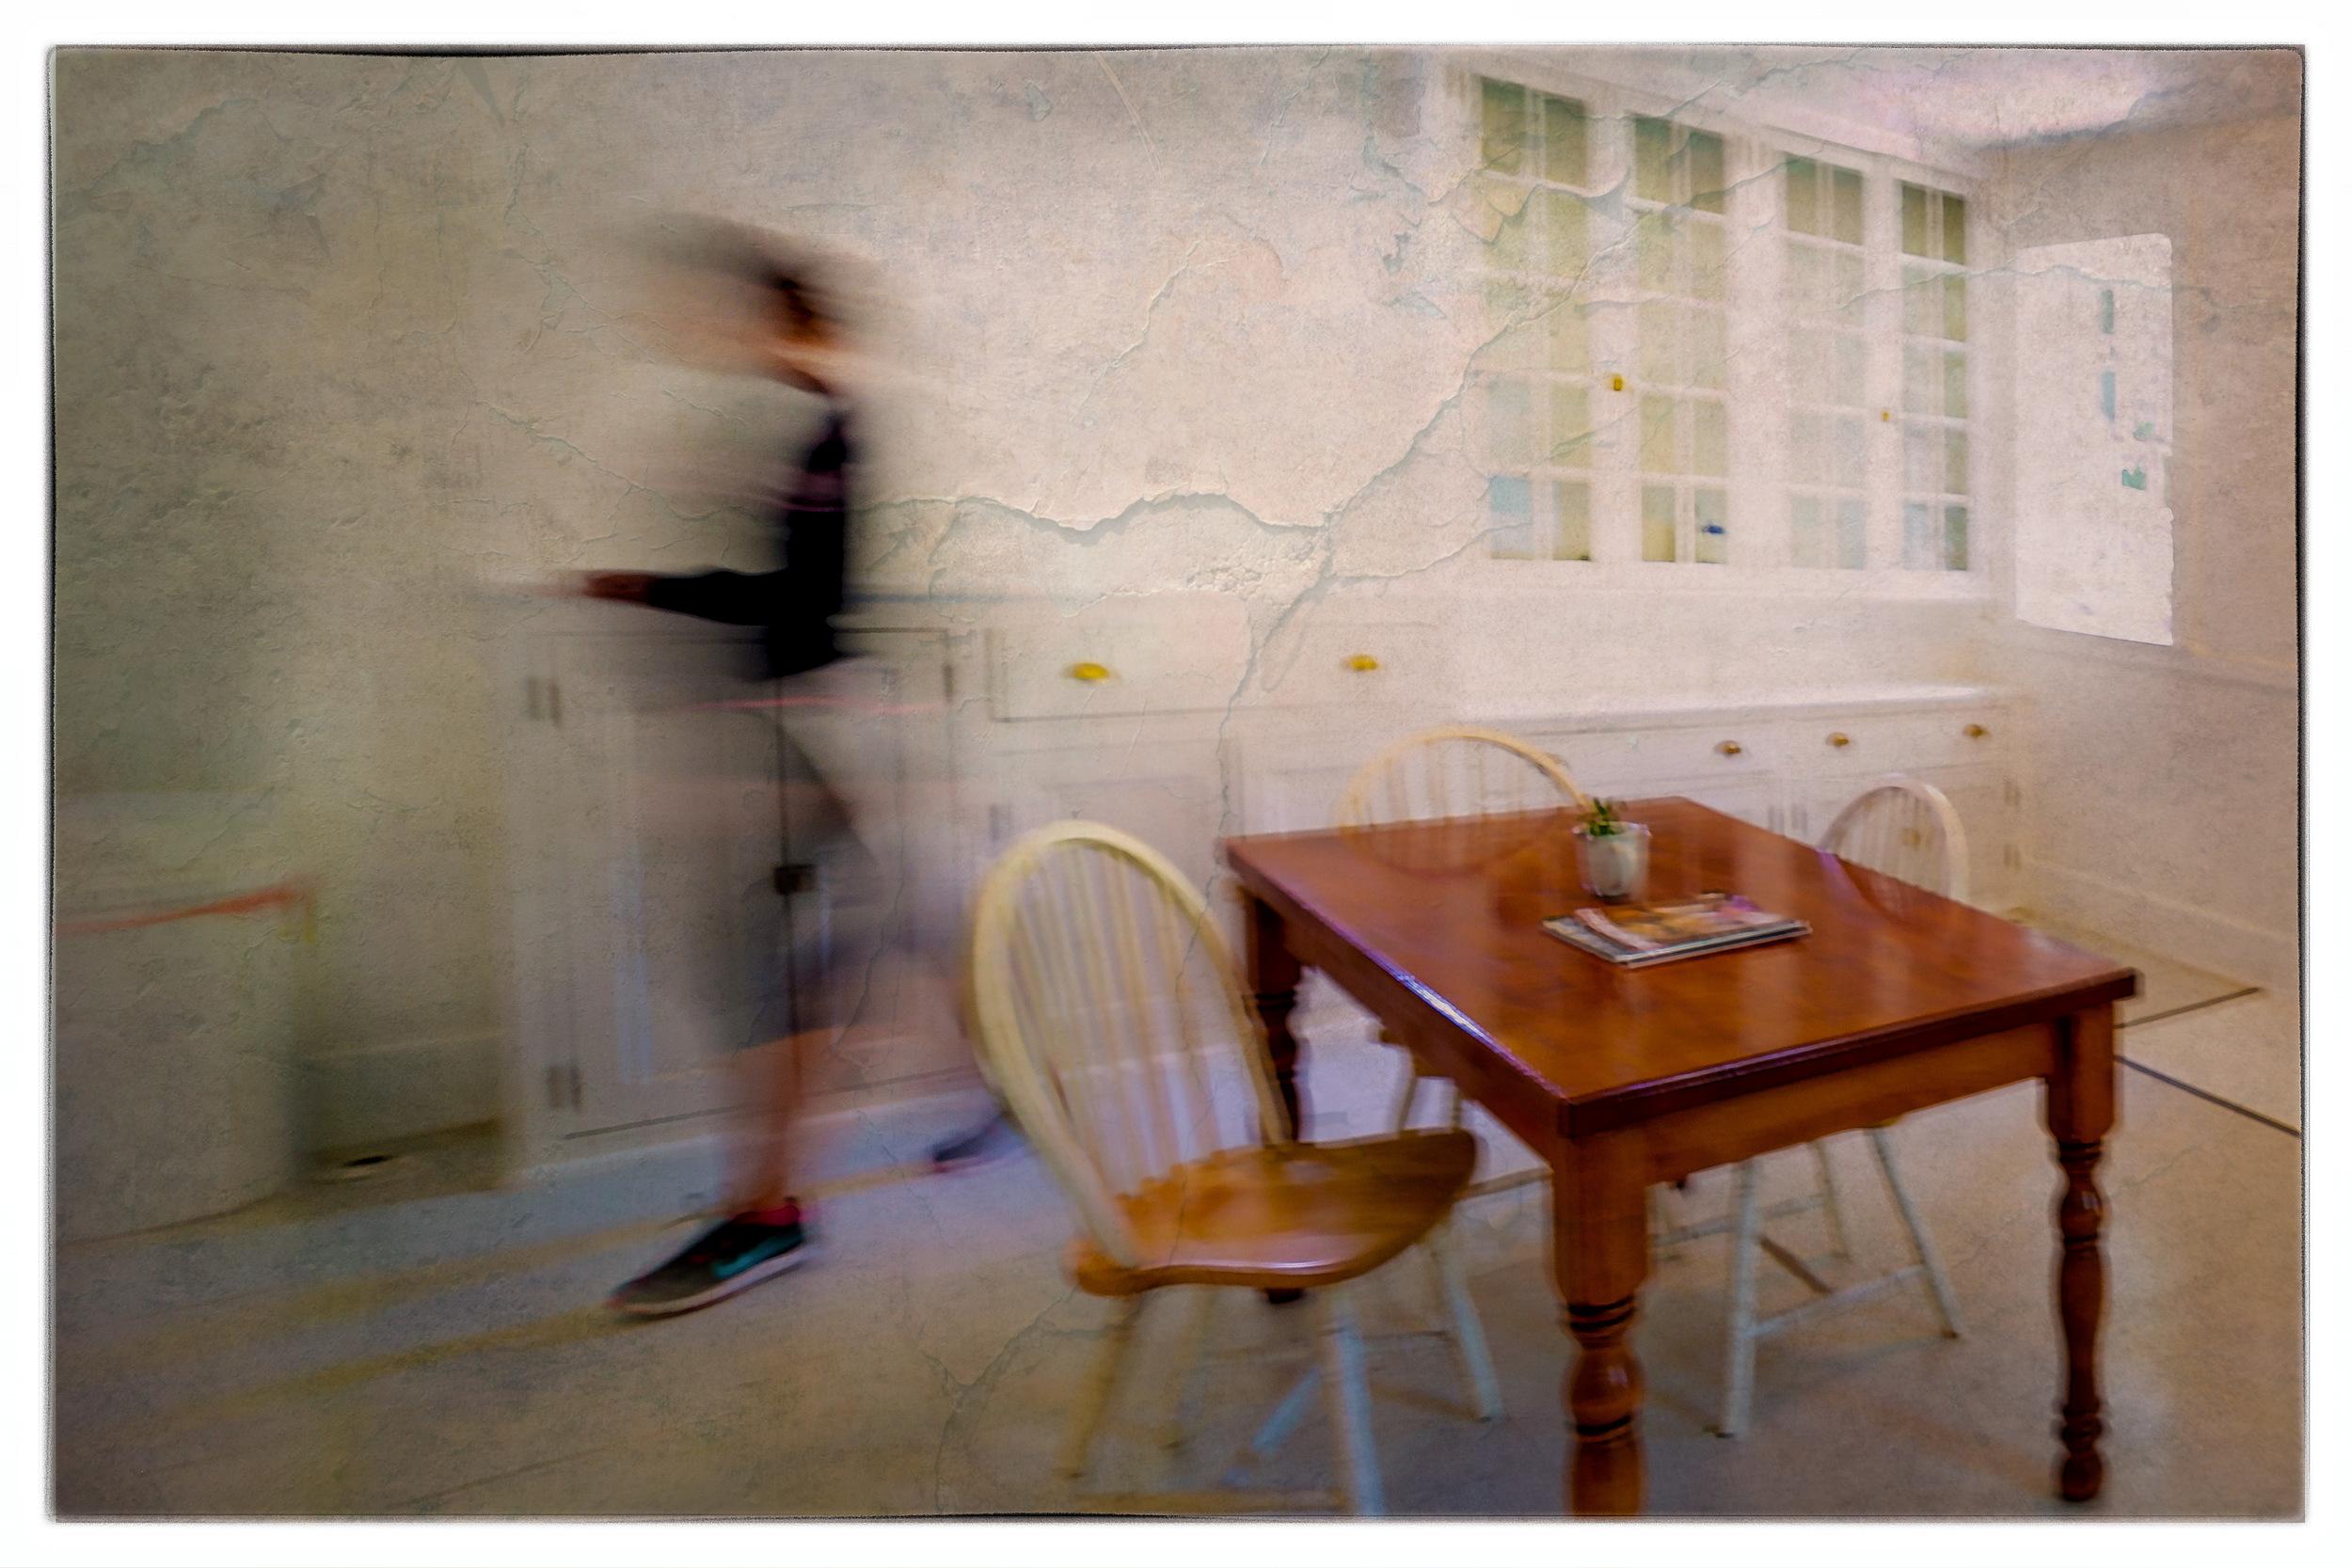 Abandoned-Kitchen-2.jpg